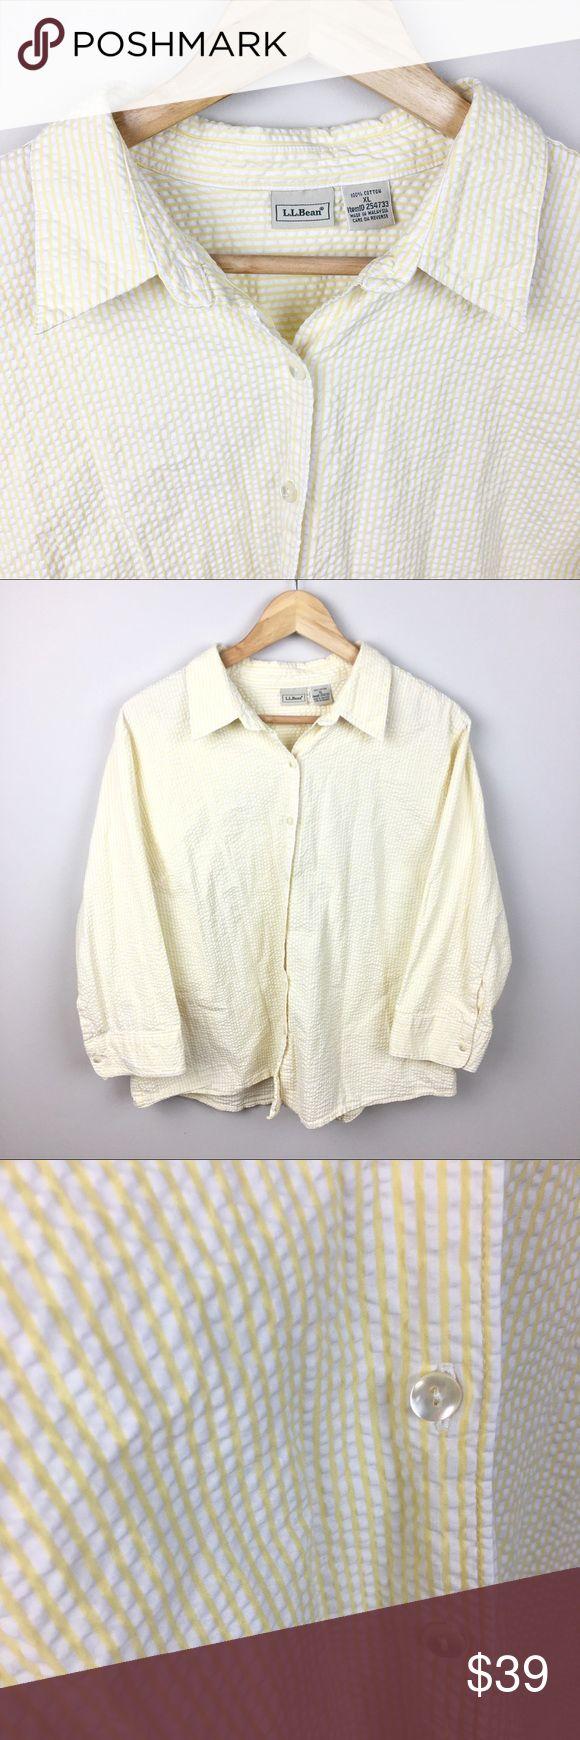 L.L. Bean Essential Seersucker Shirt - 3/4 Sleeves L.L. Bean Essential Seersucker Shirt in yellow and white stripe. Button up shirt with 3/4 length sleeves. 100% cotton. Size XL. L.L. Bean Tops Button Down Shirts